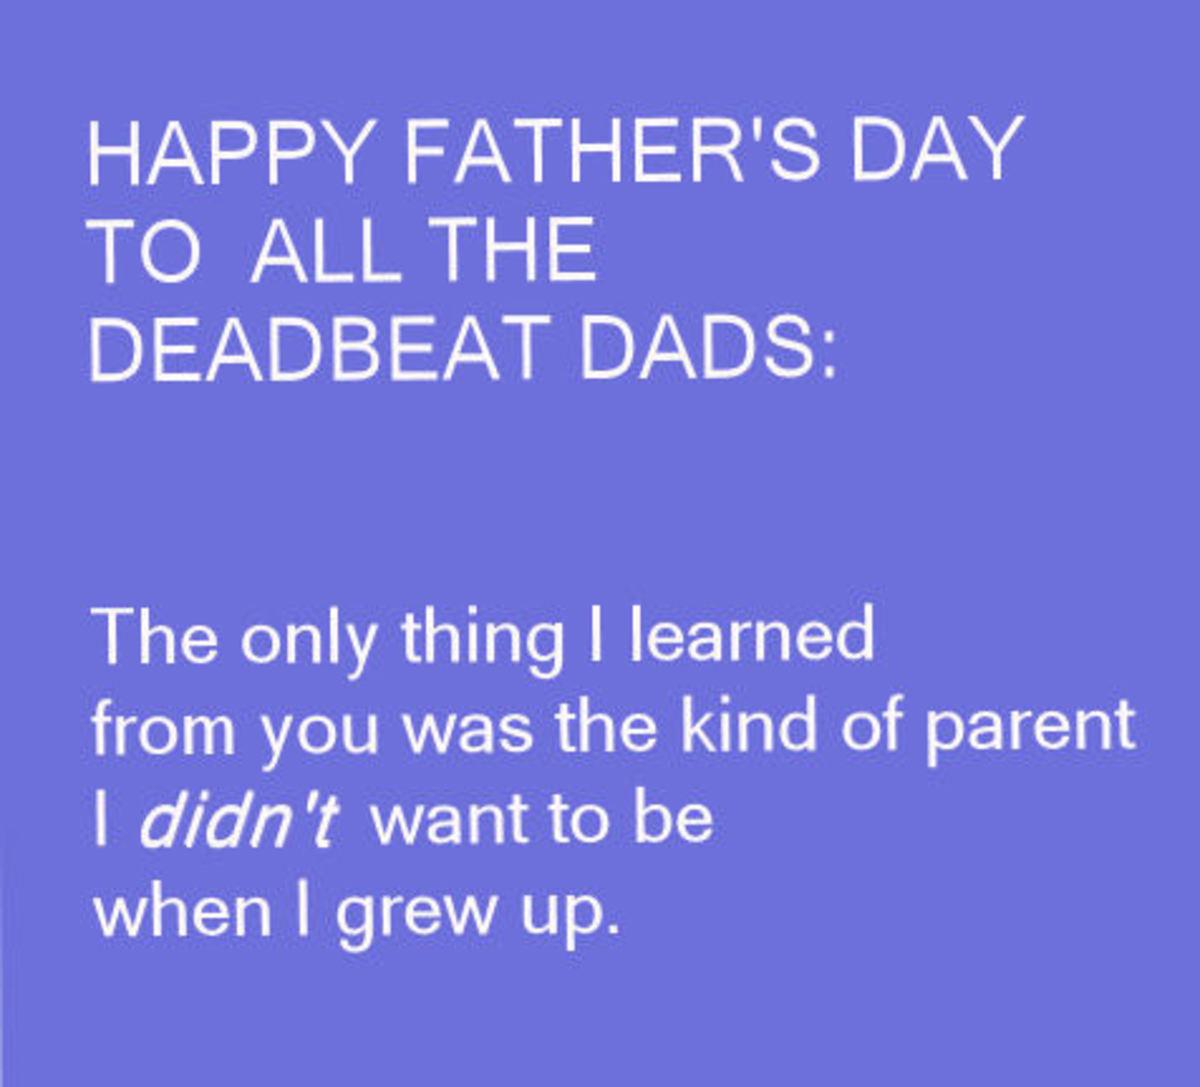 deadbeat-dads-deadbeat-dad